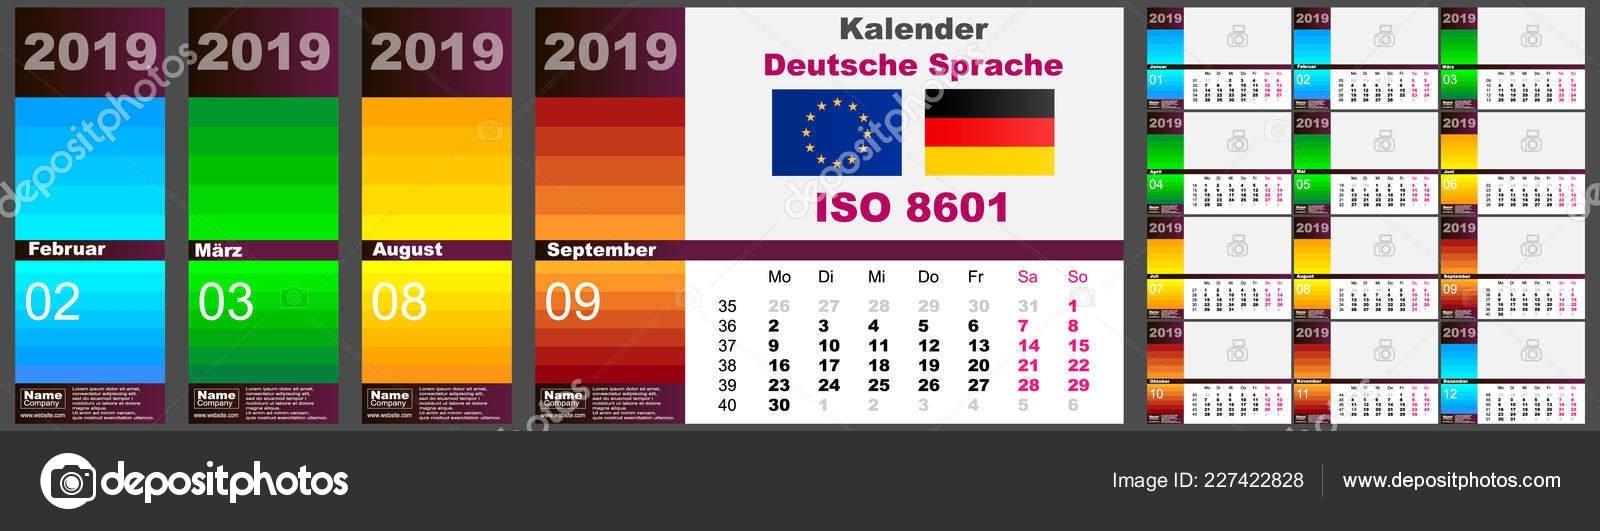 Wall Calendar Deutsche German Dutch Language For 2019, Iso